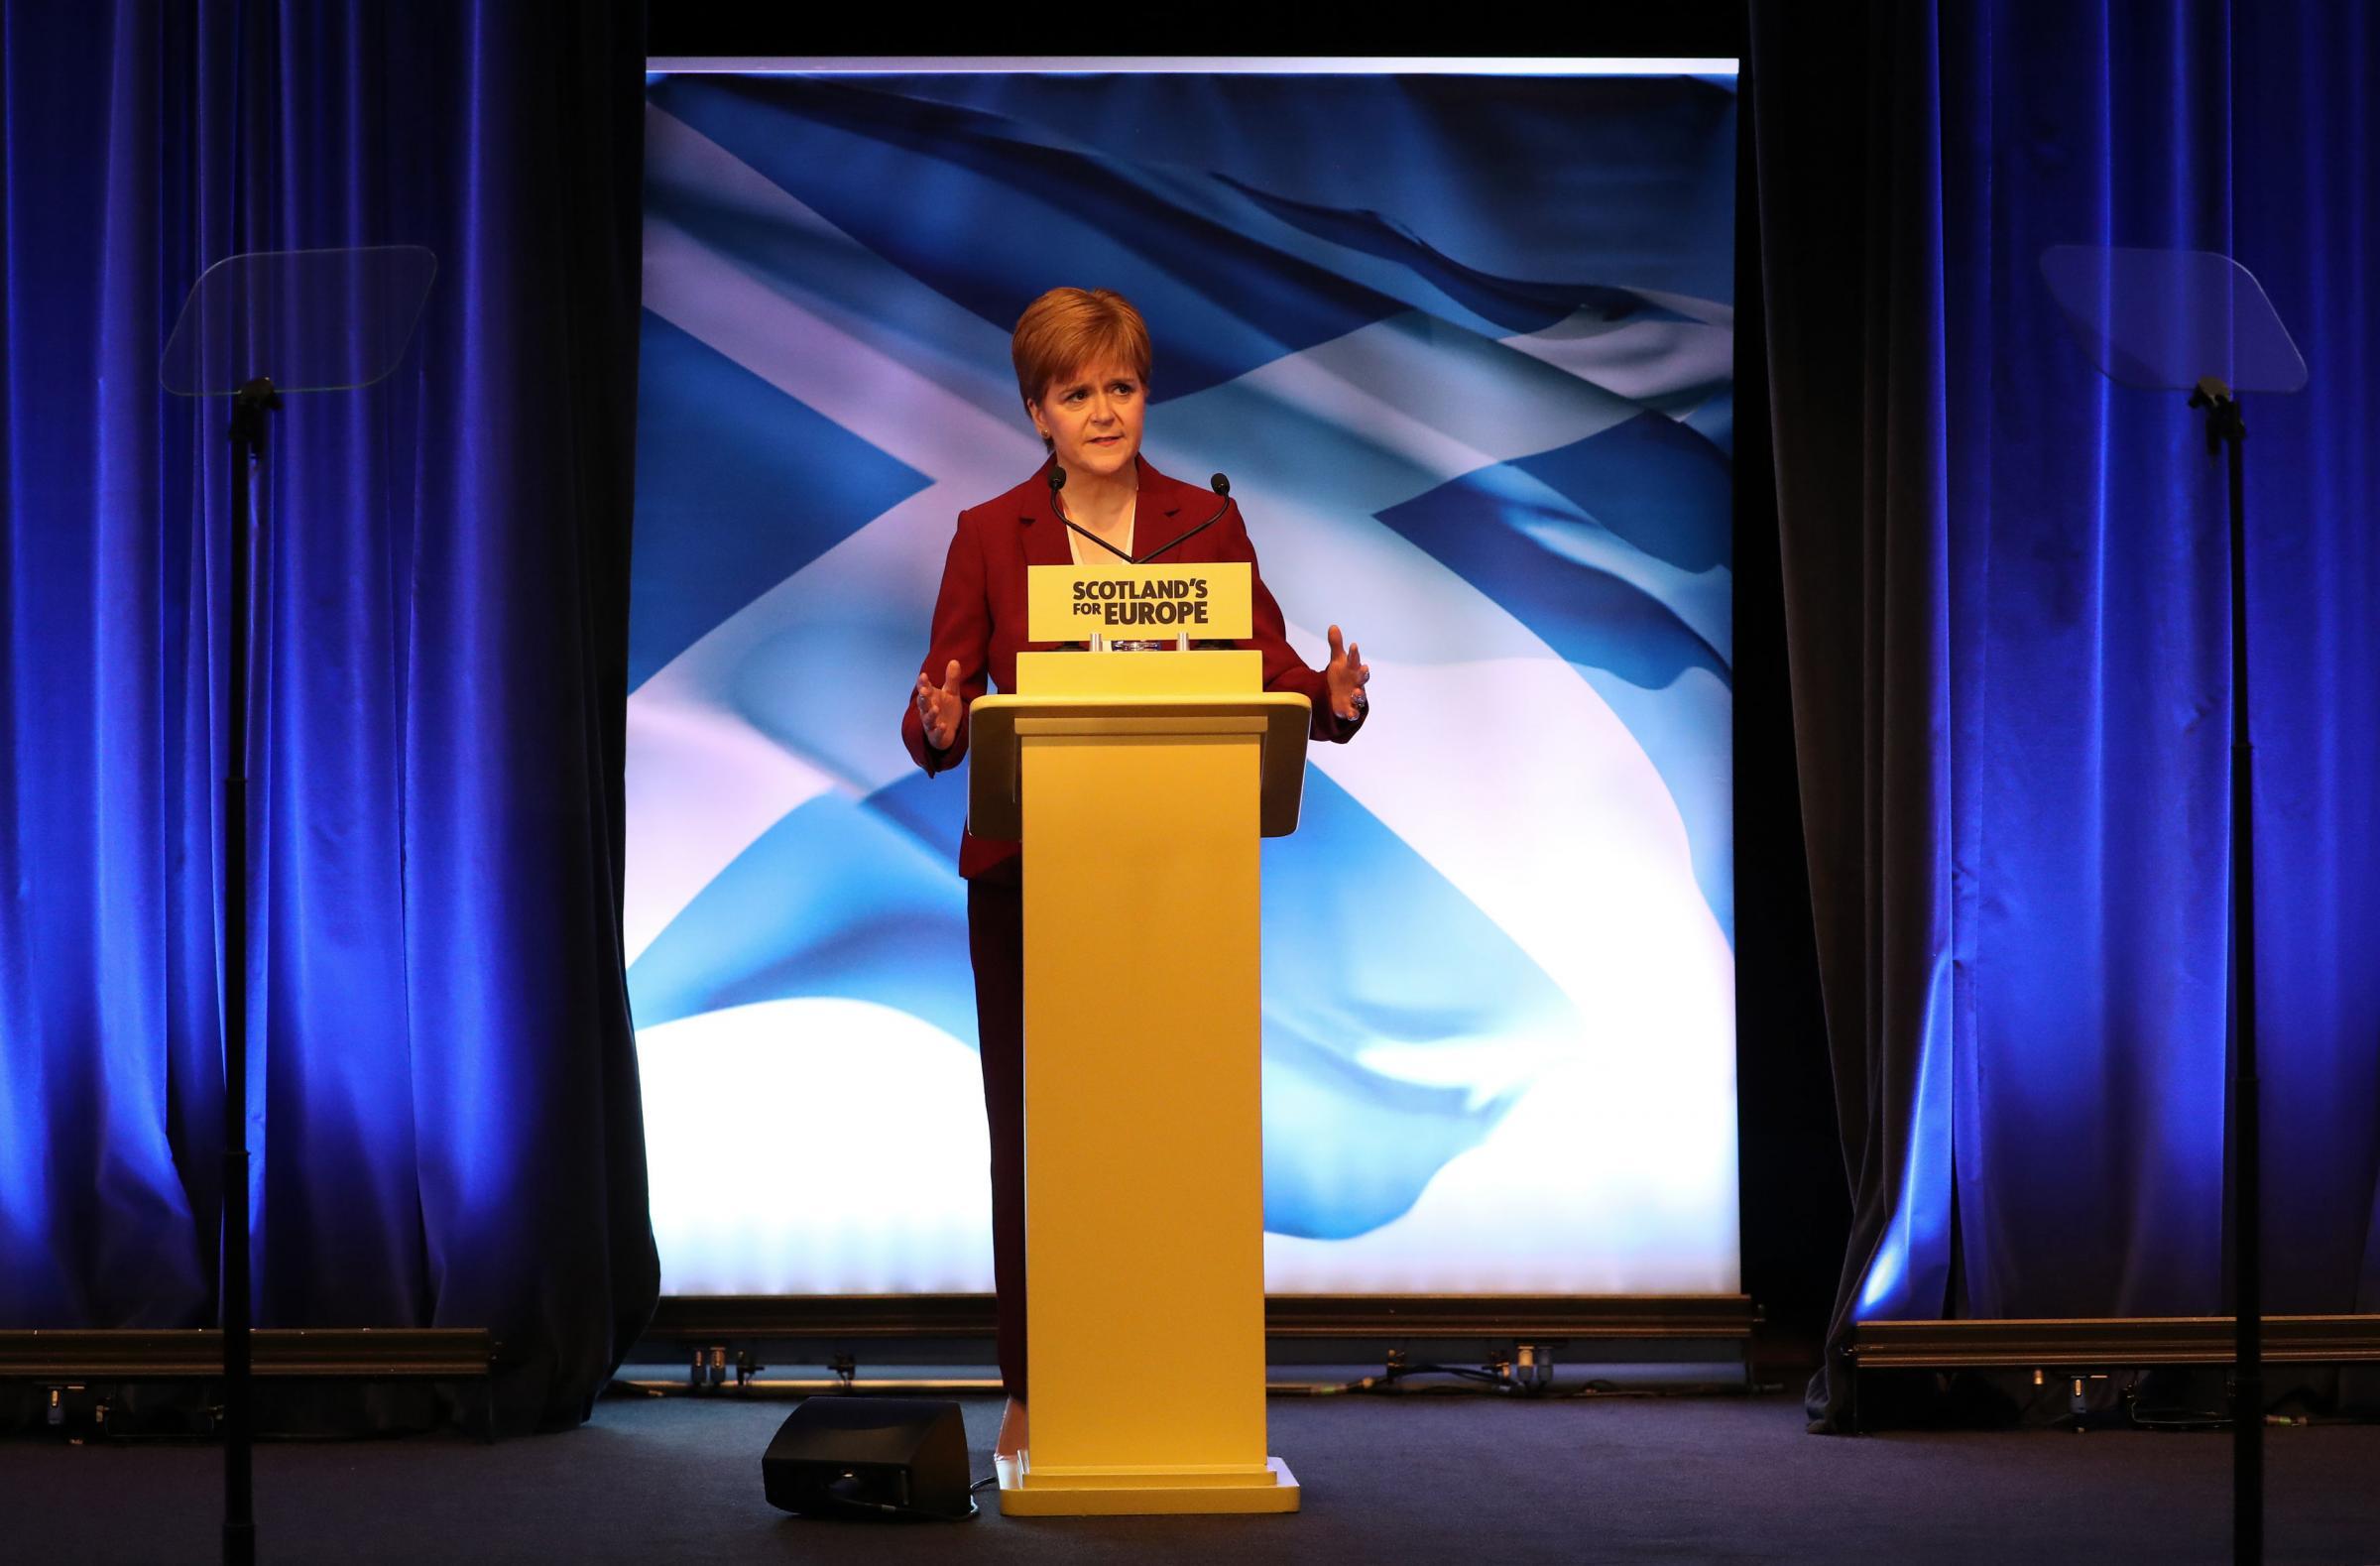 Nicola Sturgeon: Final election debate was utterly woeful